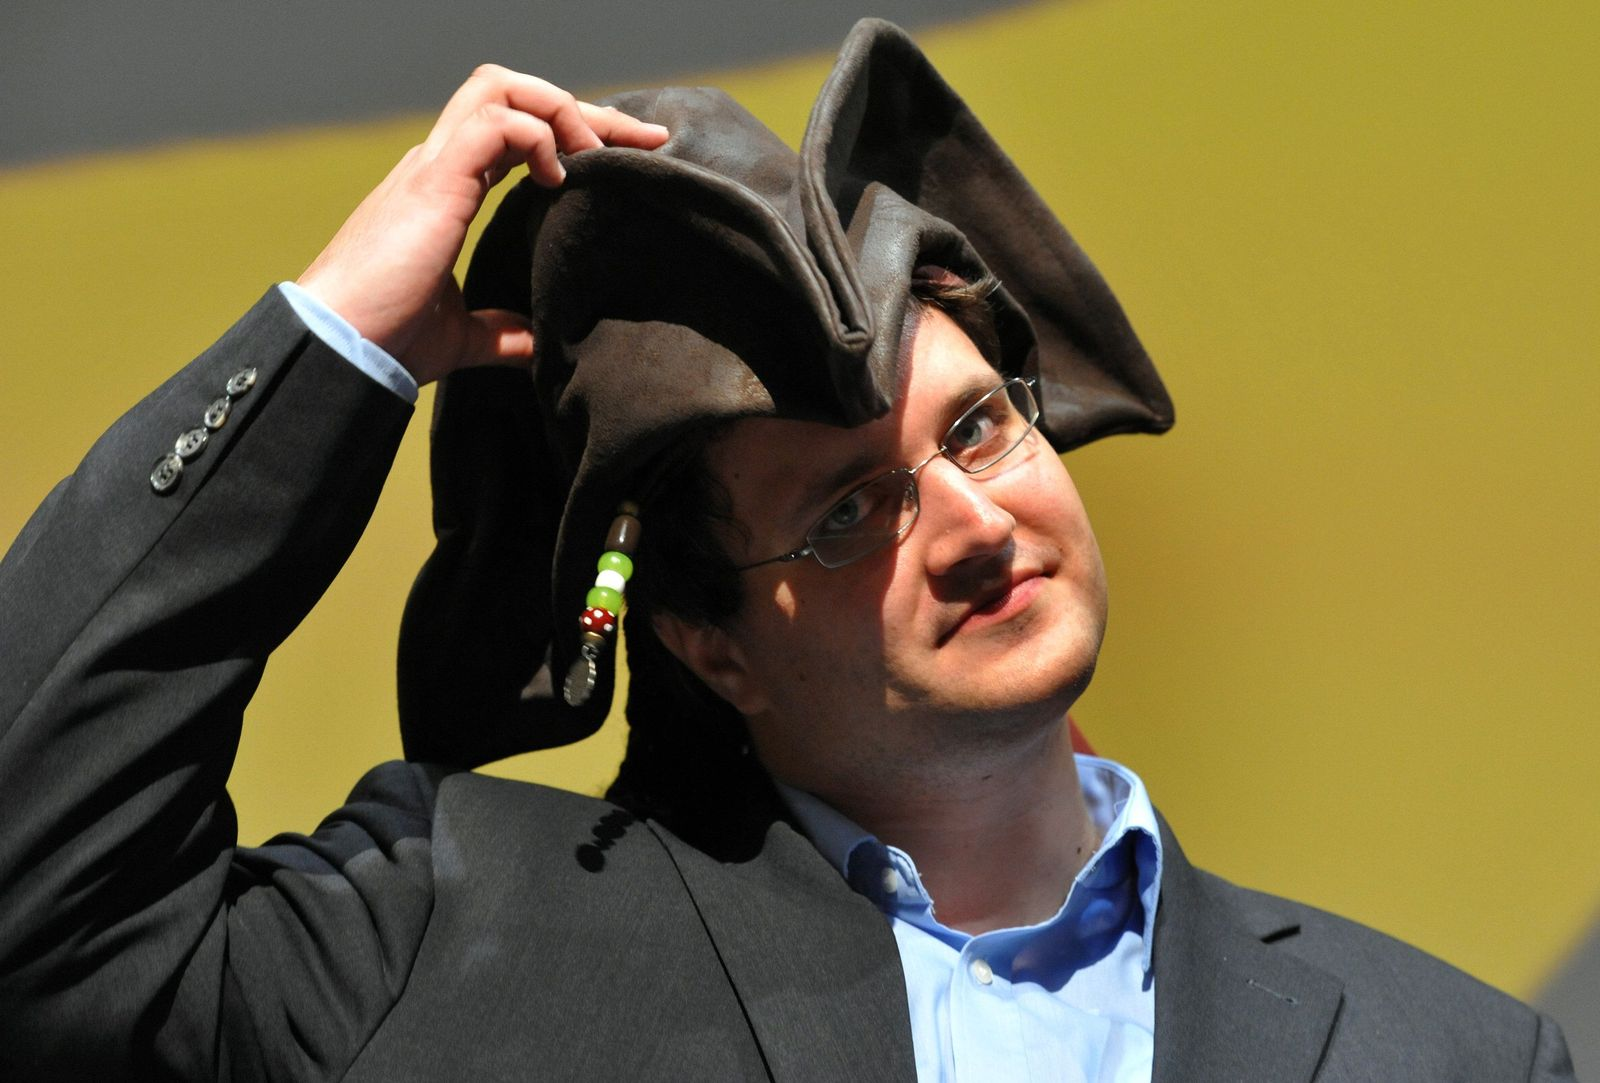 Piratenpartei / Sebastian Nerz